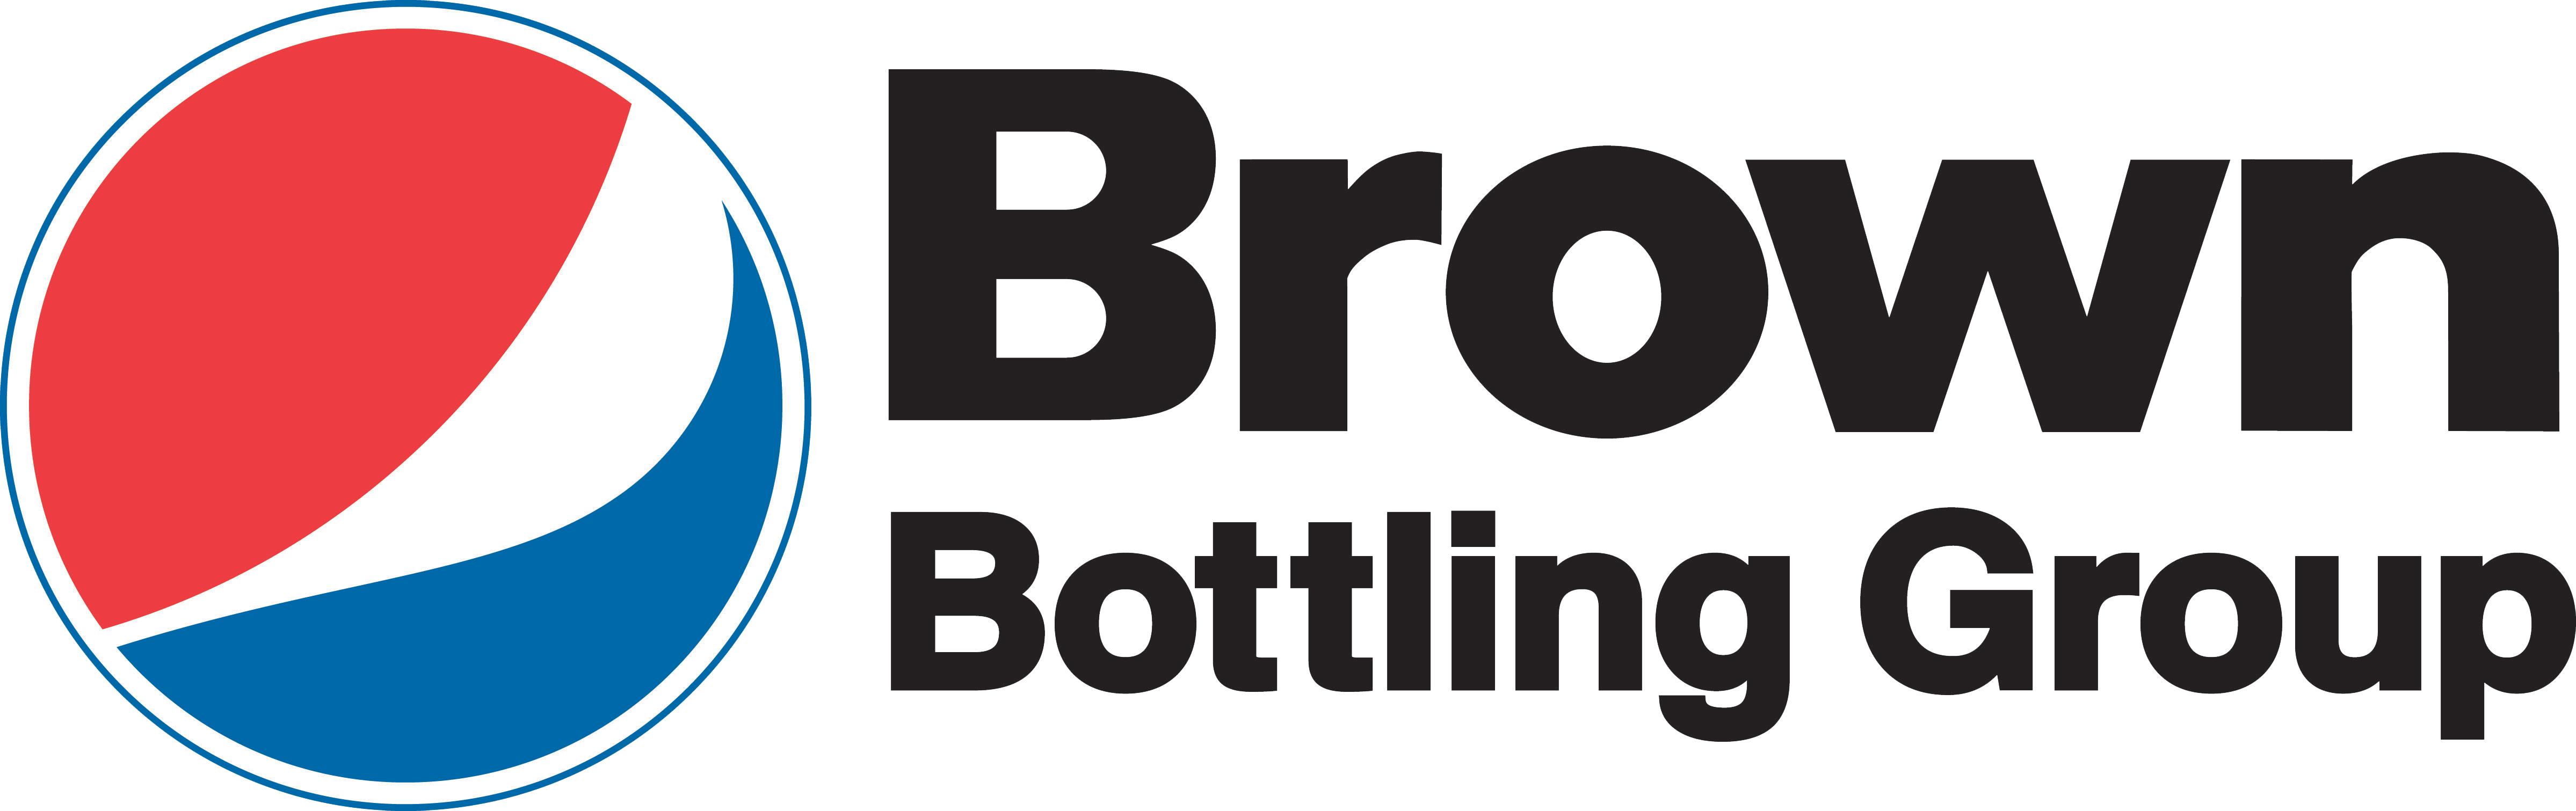 BBGLogo_Large.png